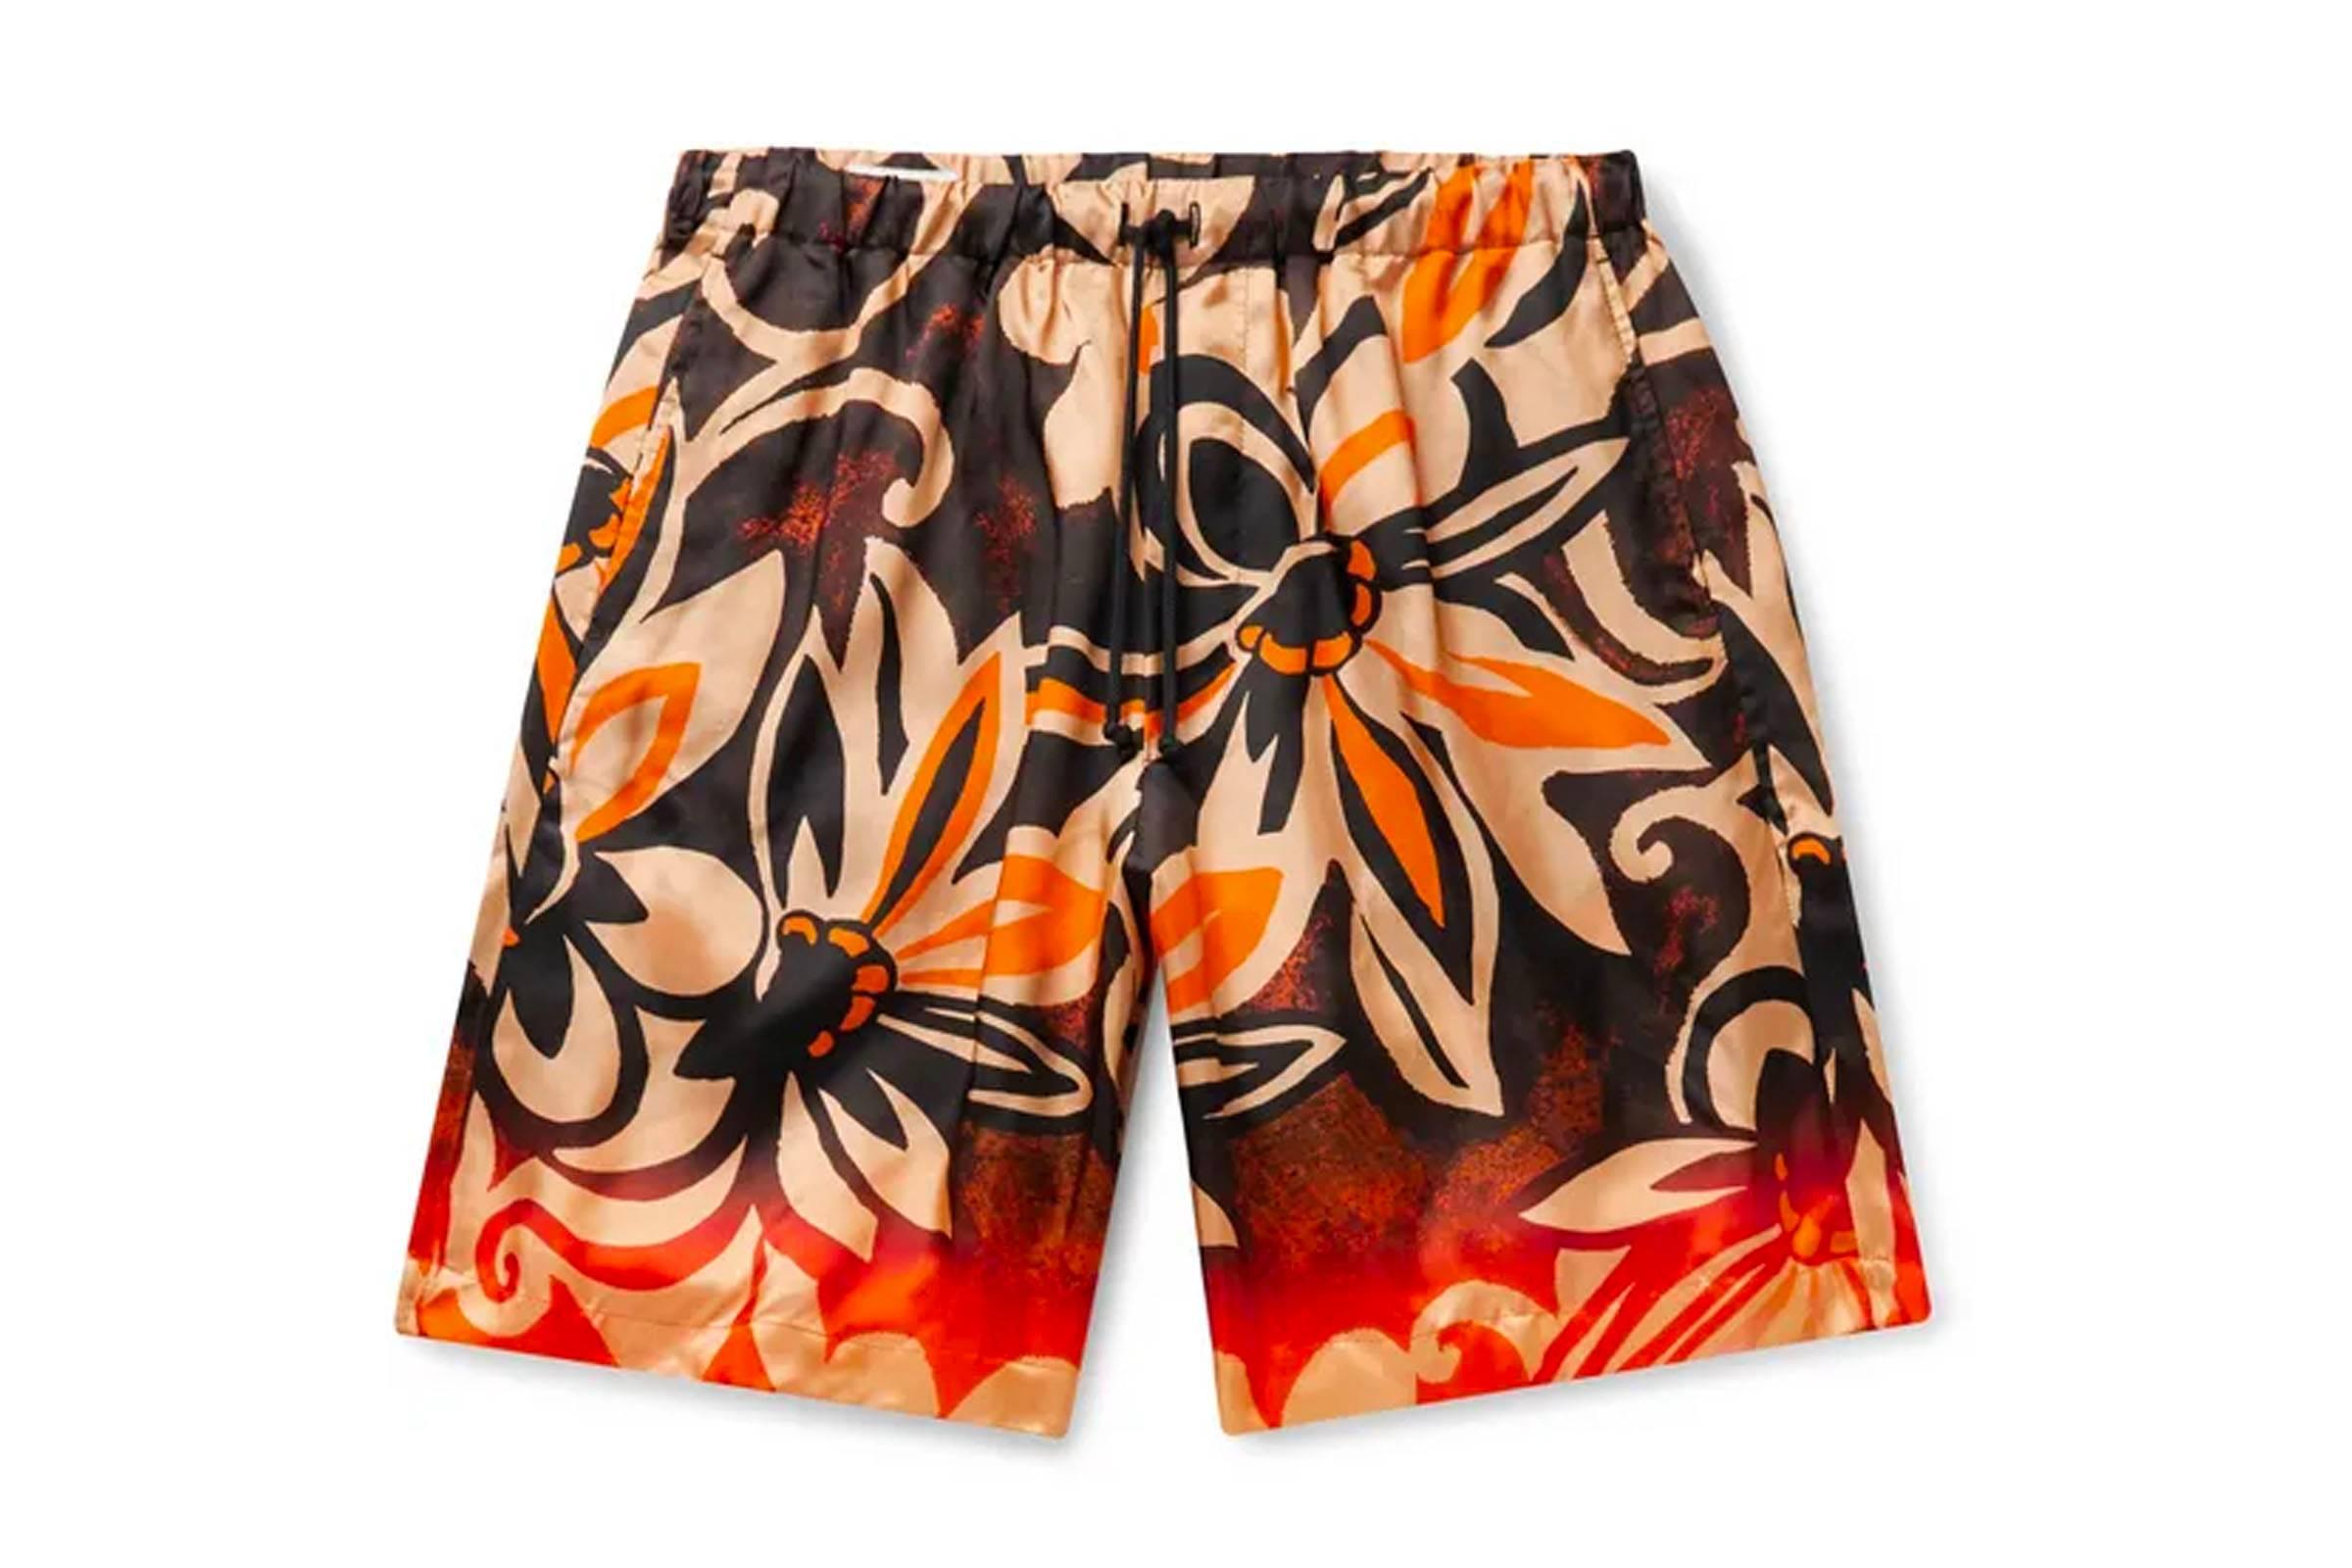 Dries Van Noten Printed Silk Shorts